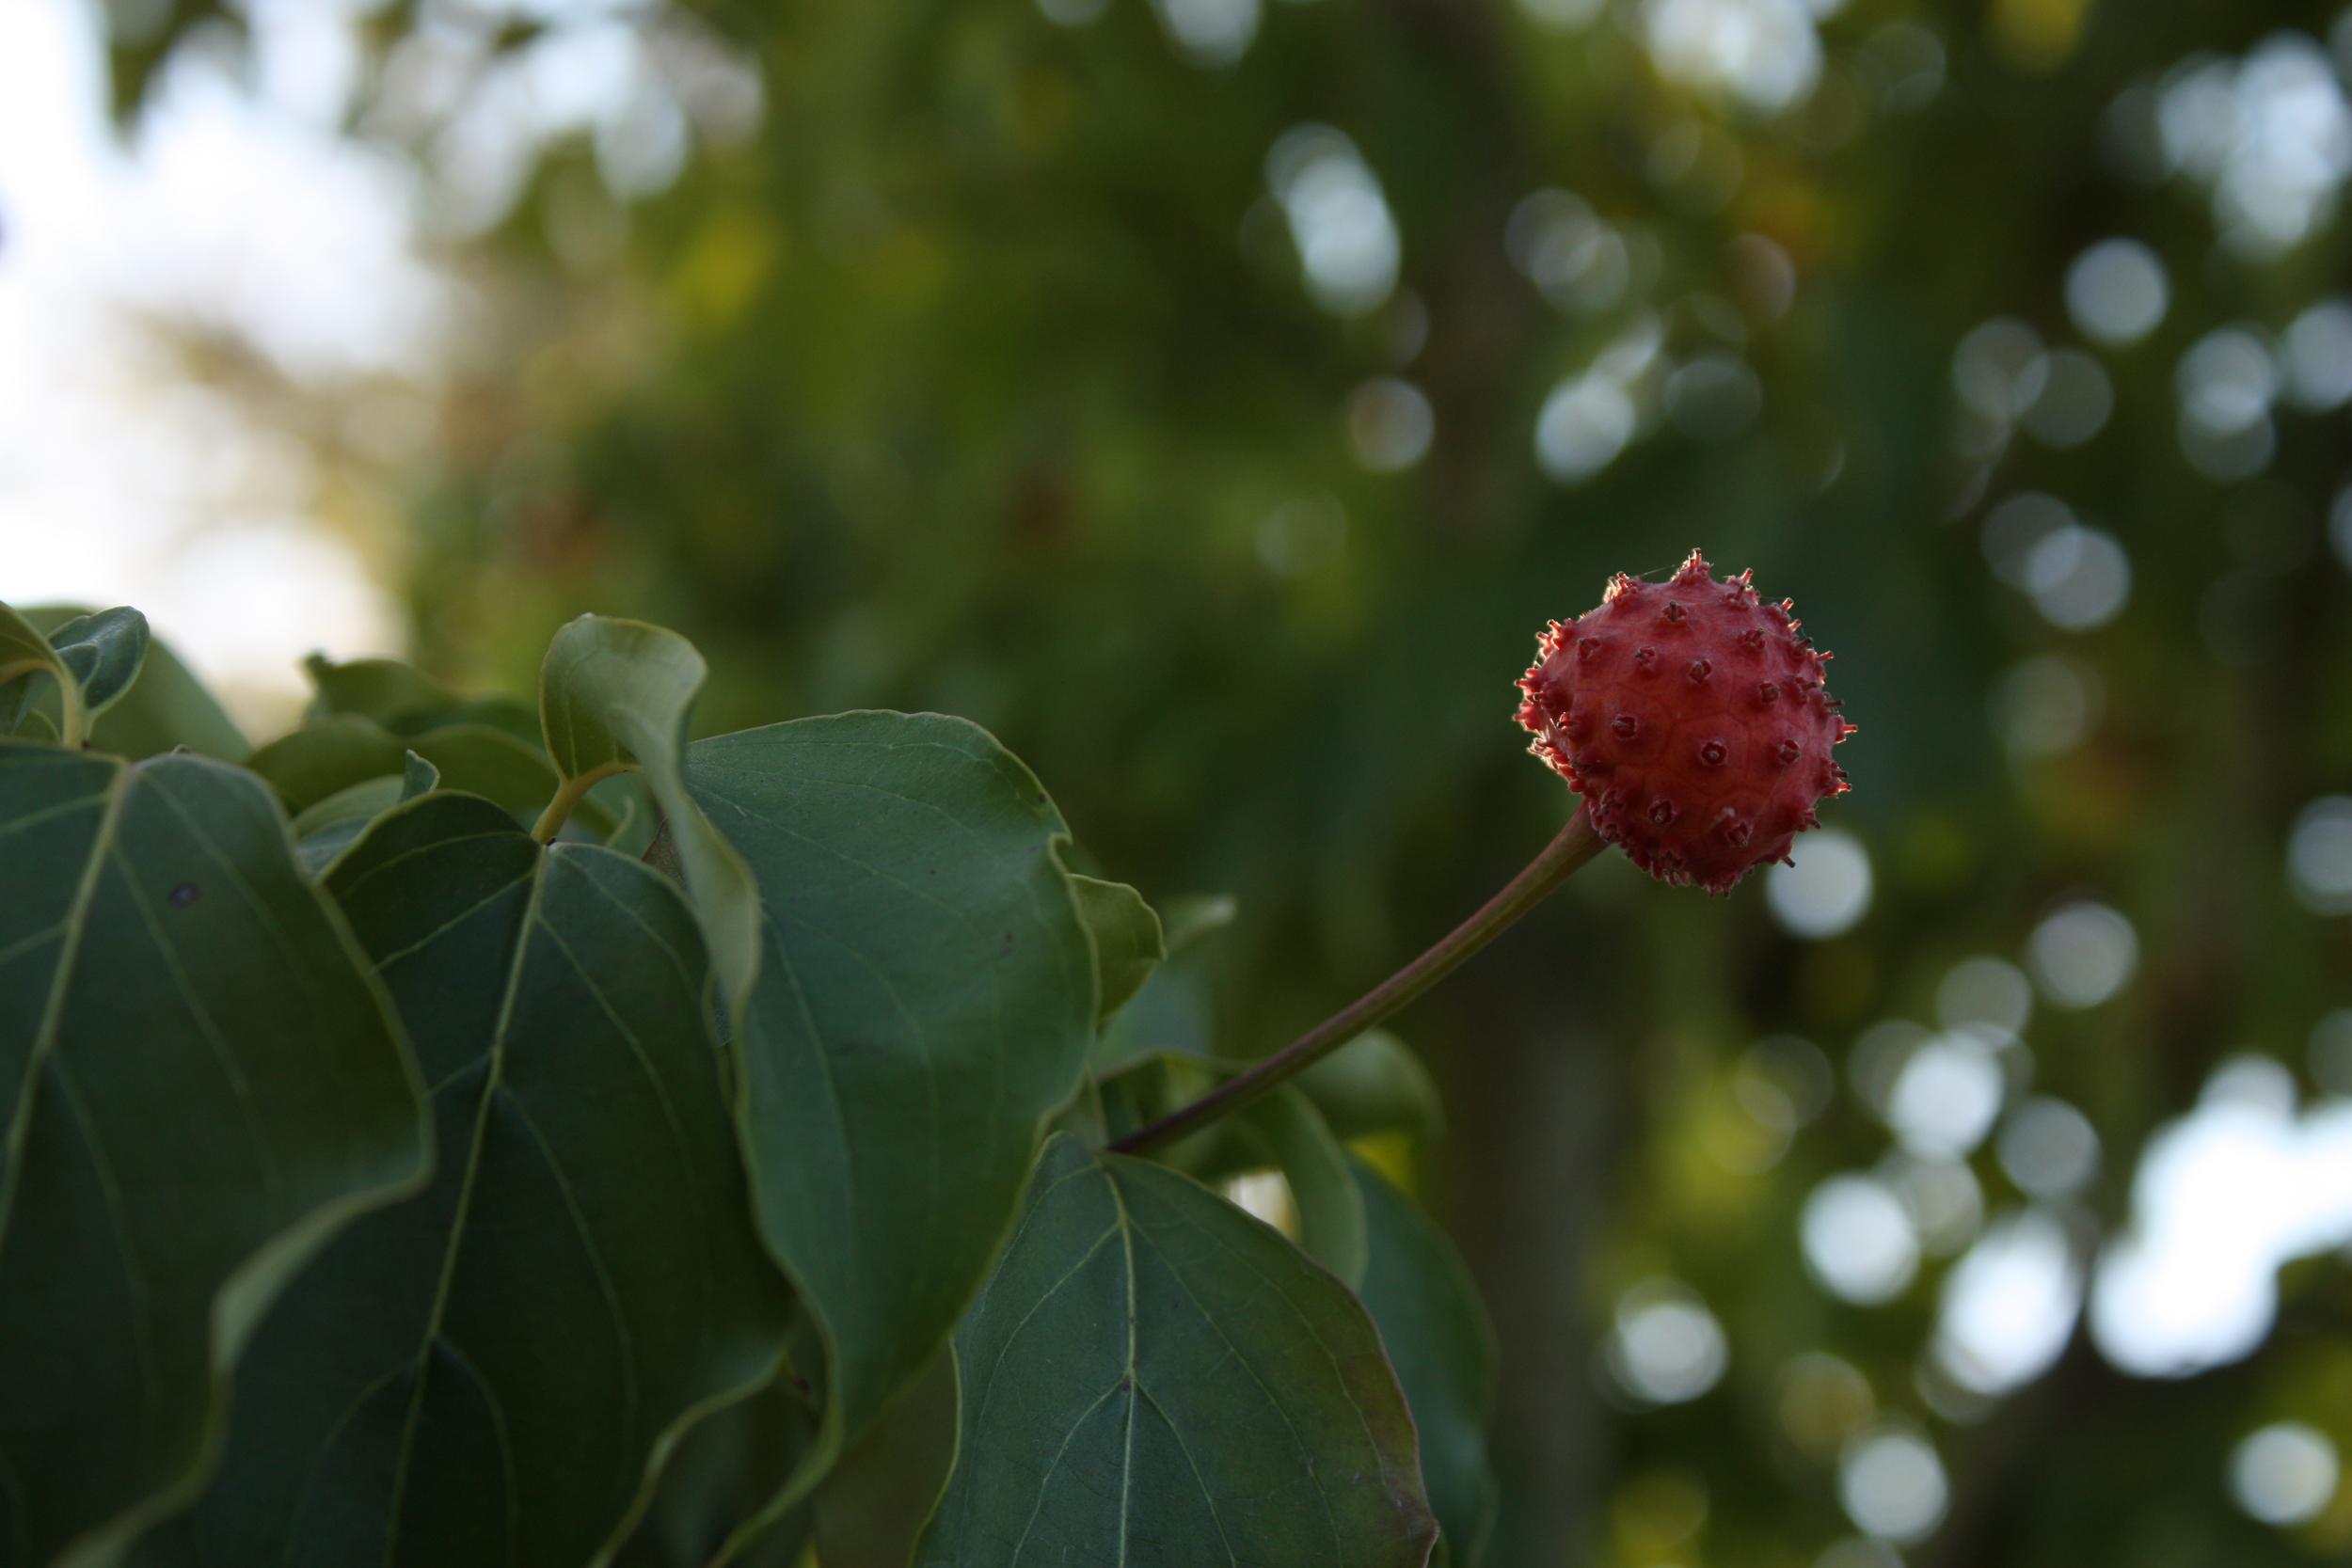 Kousa dogwood berry